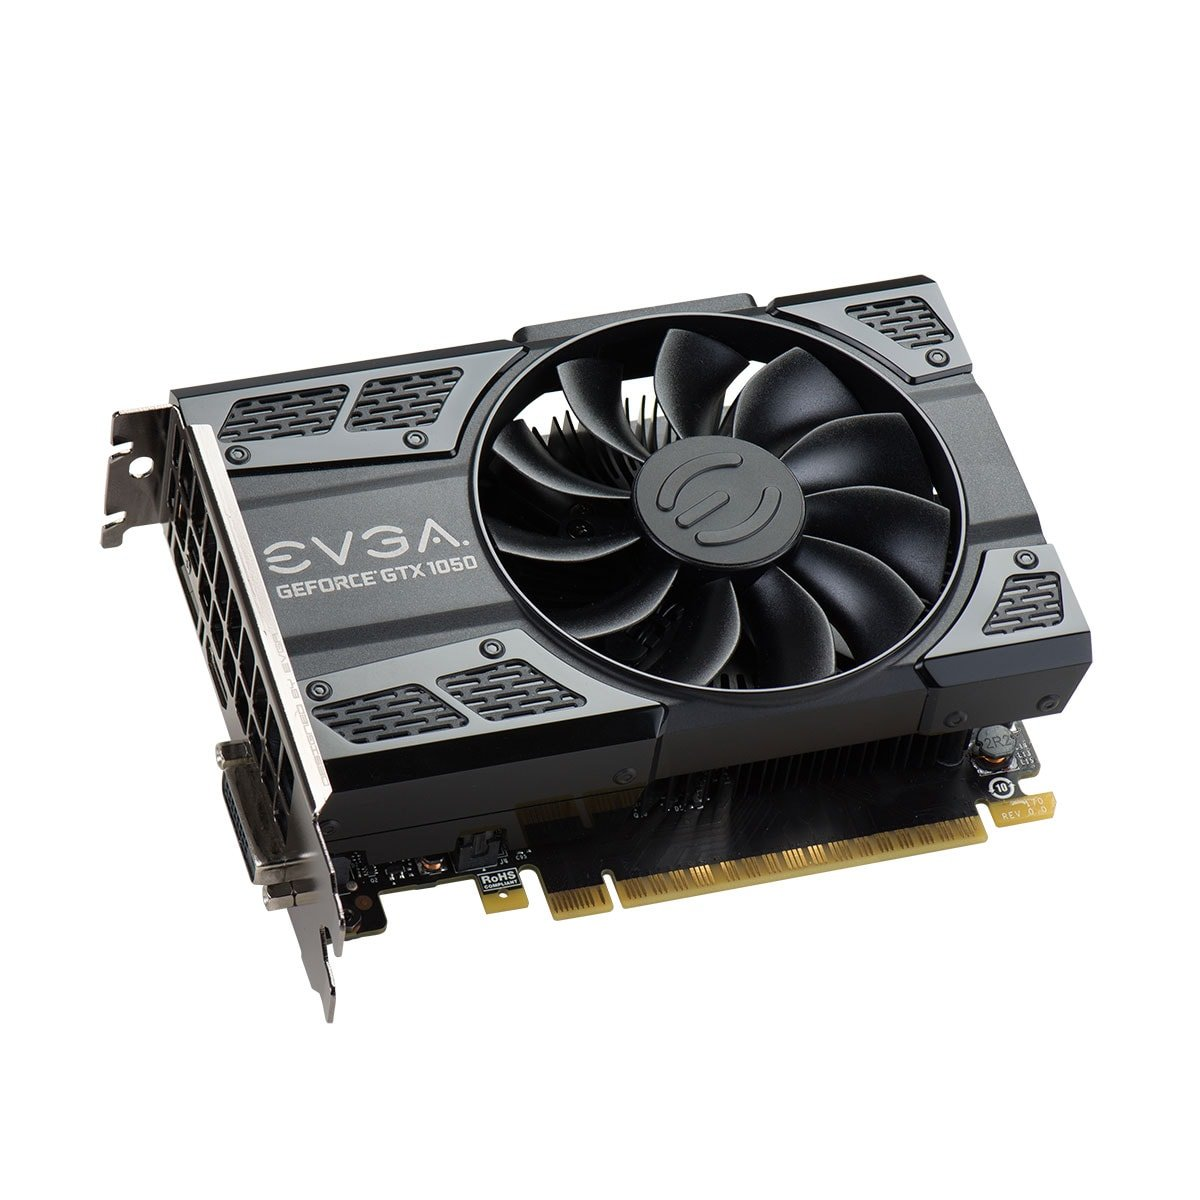 EVGA GeForce GTX 1050 SC Gaming (02G-P4-6152-KR) - Achat / Vente Carte Graphique sur Cybertek.fr - 5